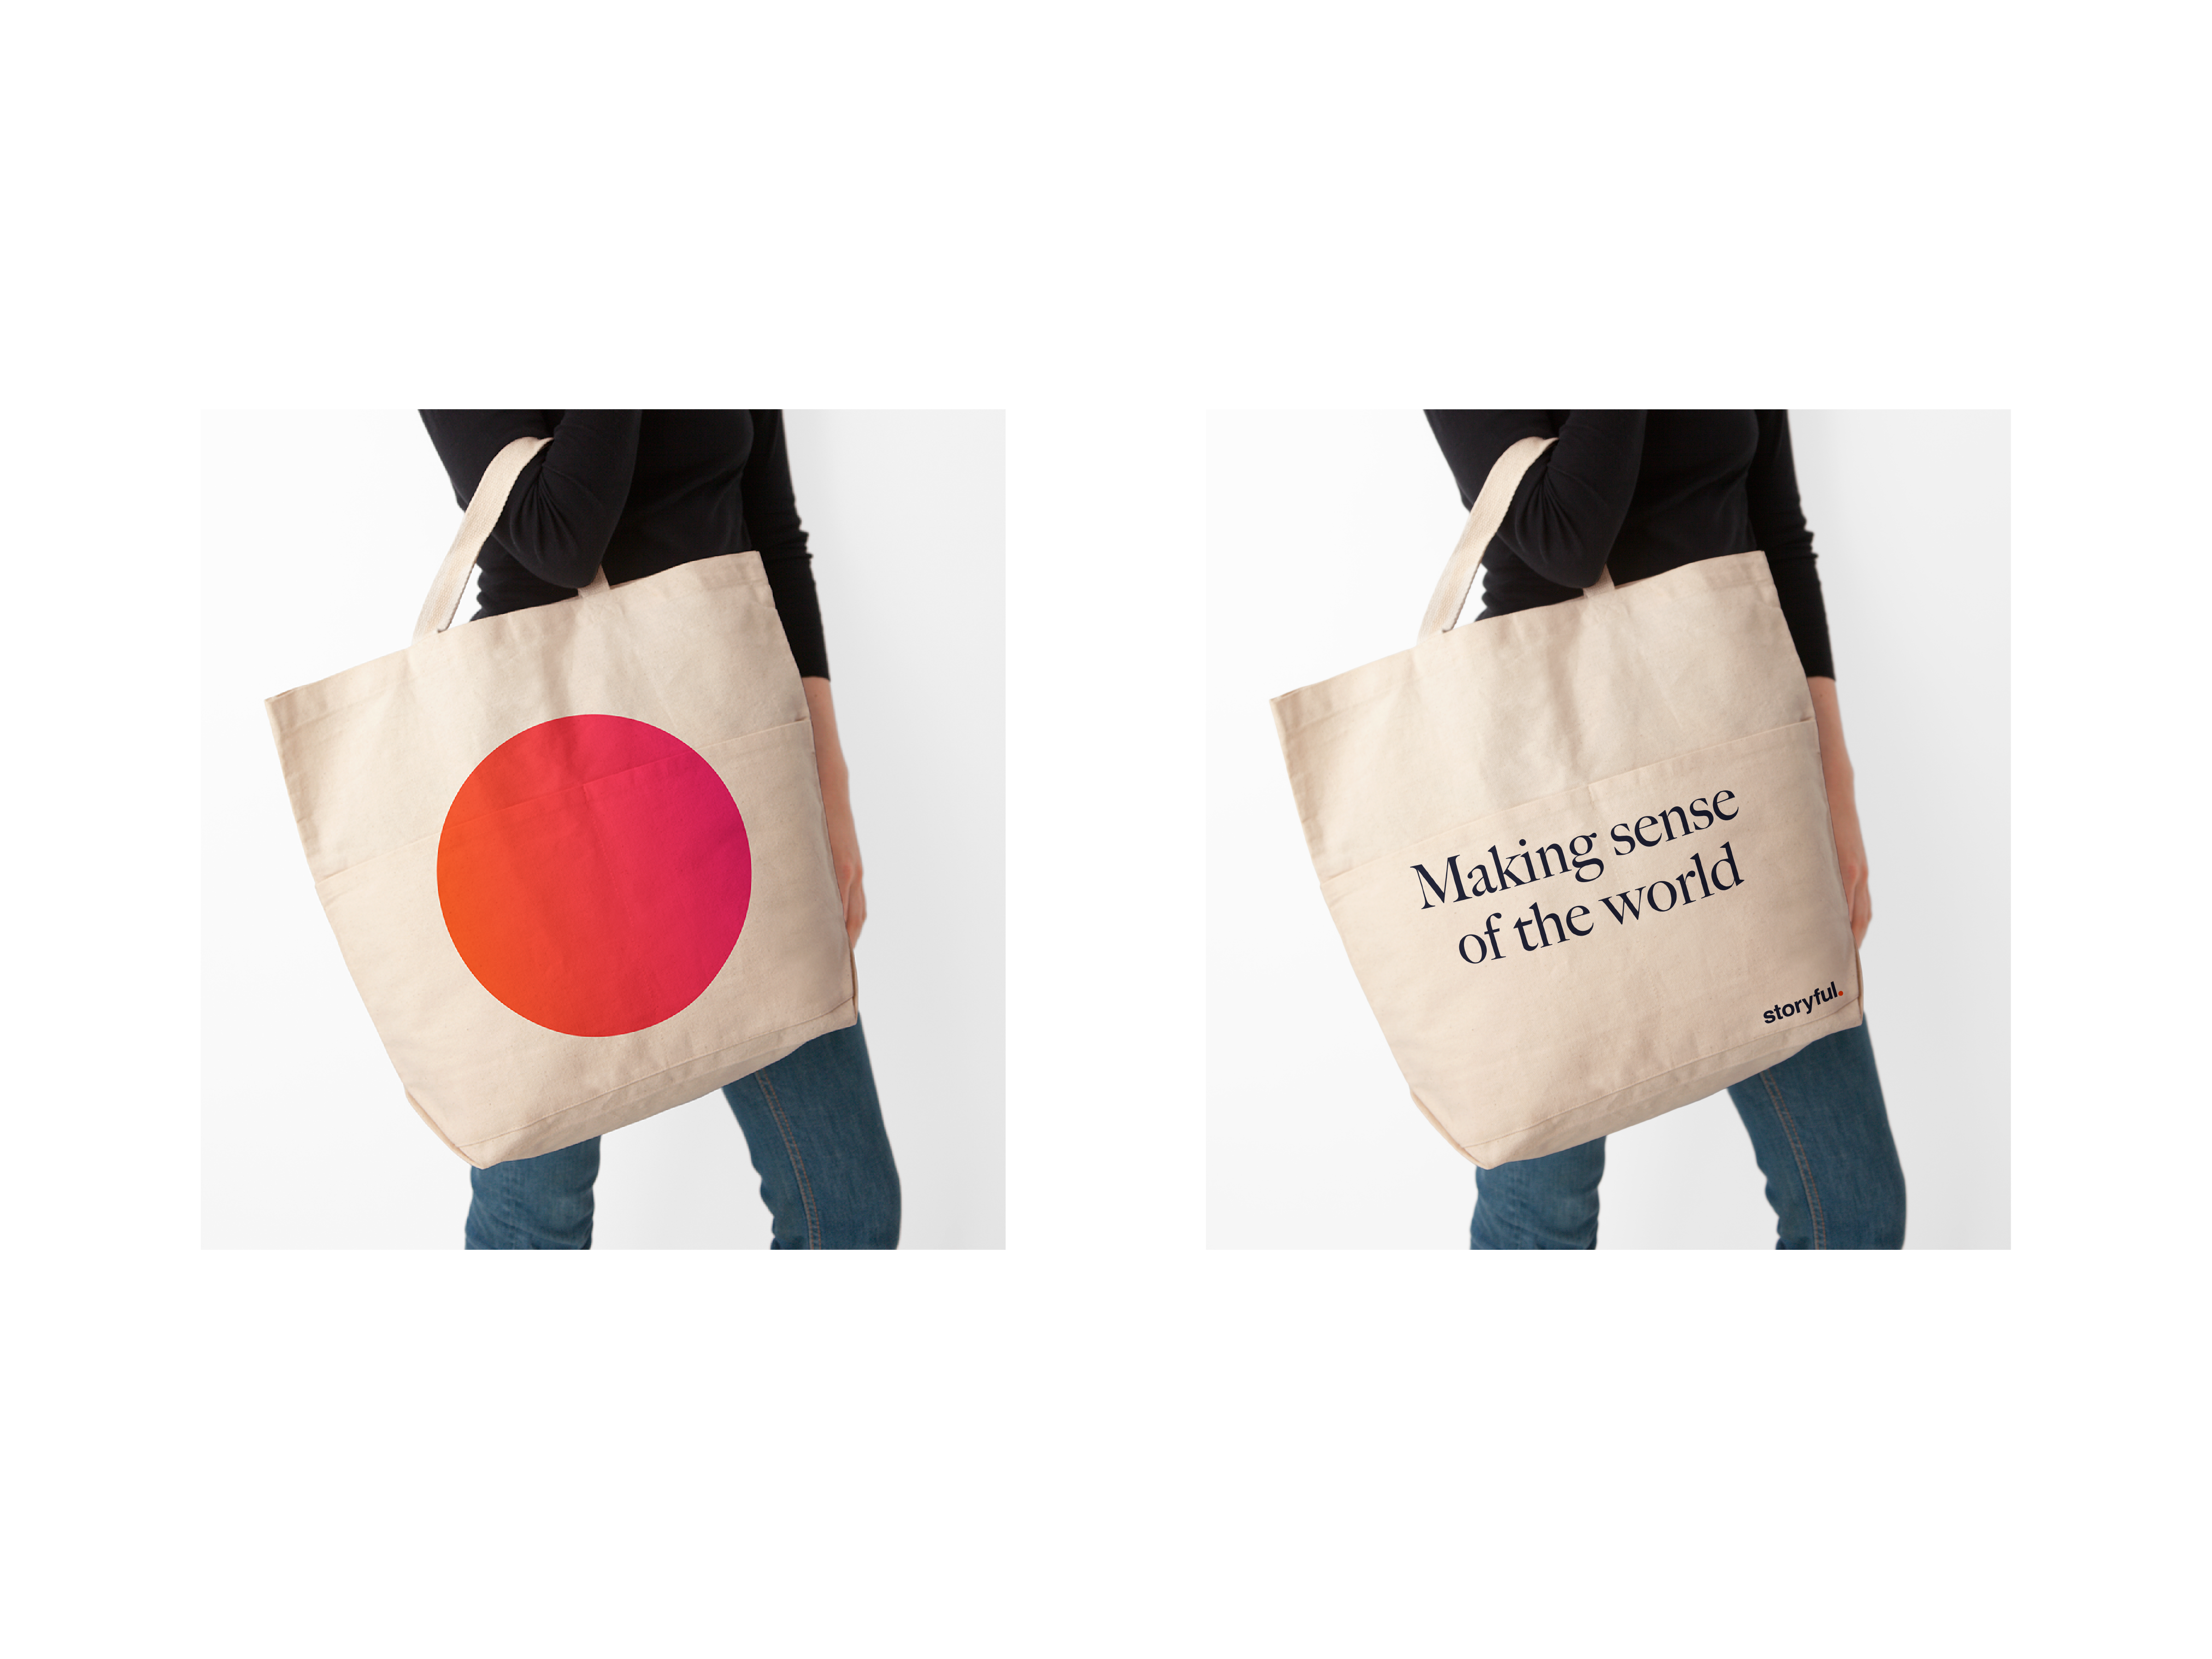 Tote bag mockup for Storyful